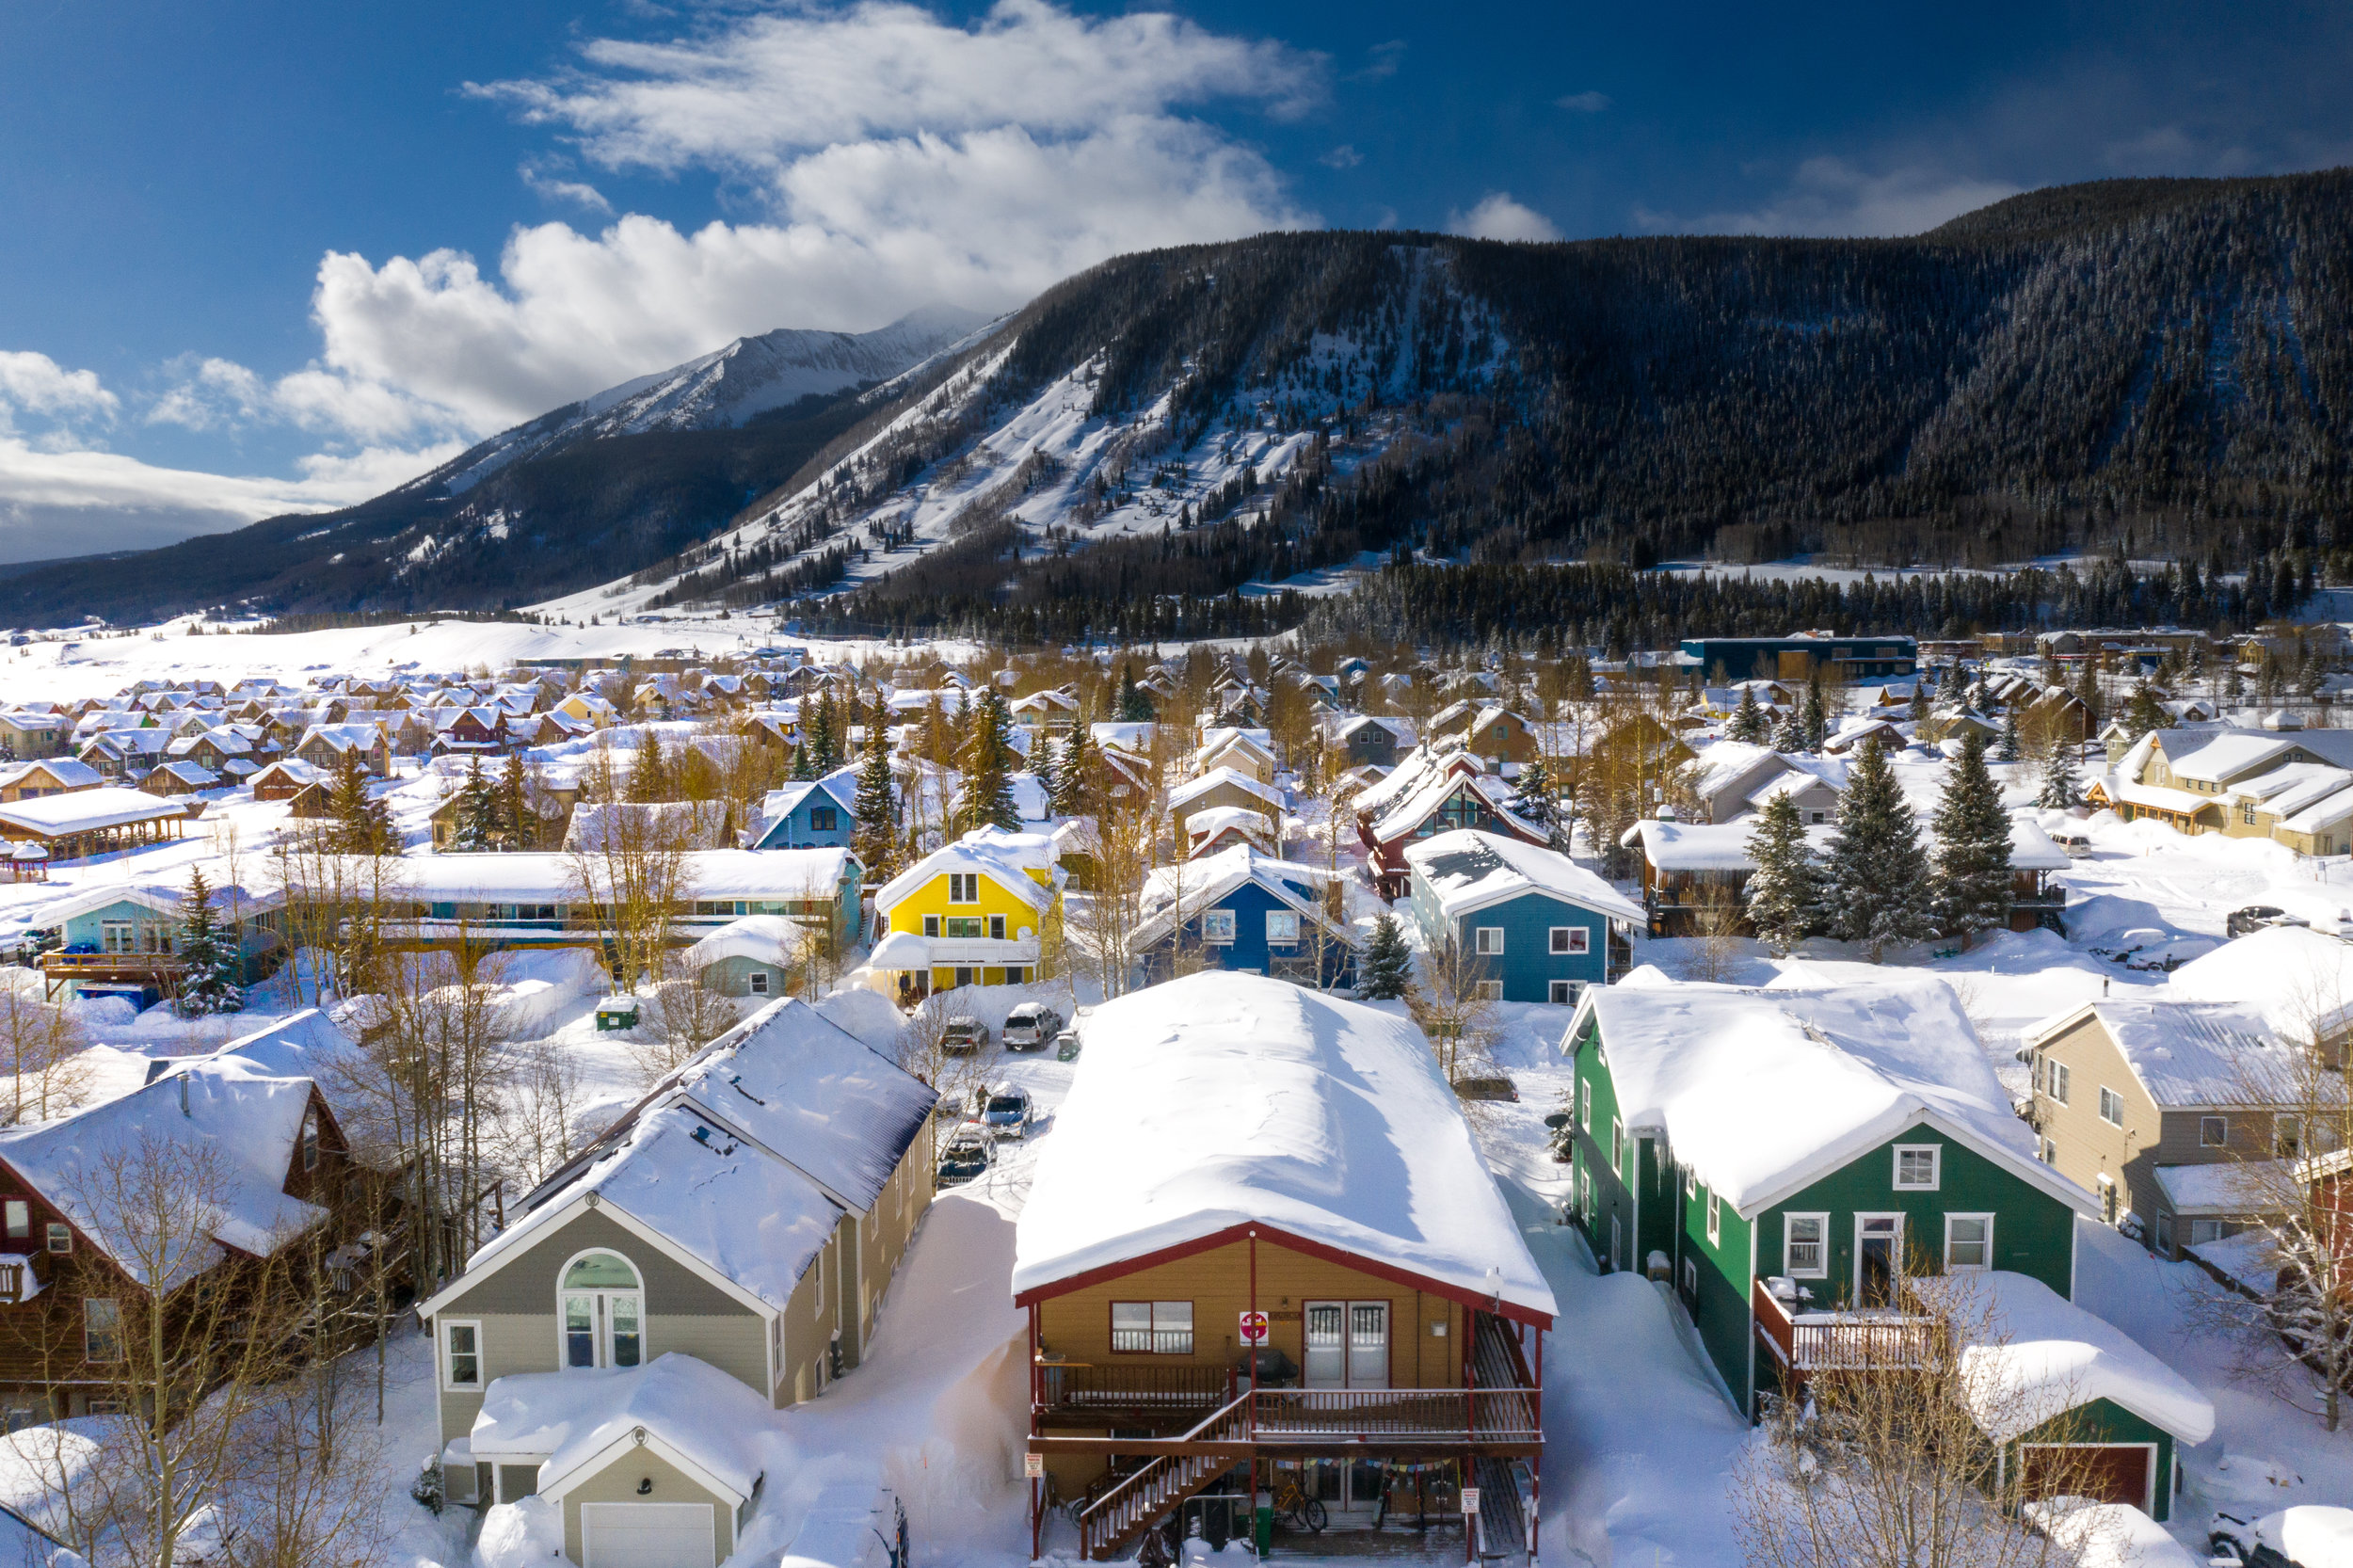 Town_Snow-0535.jpg